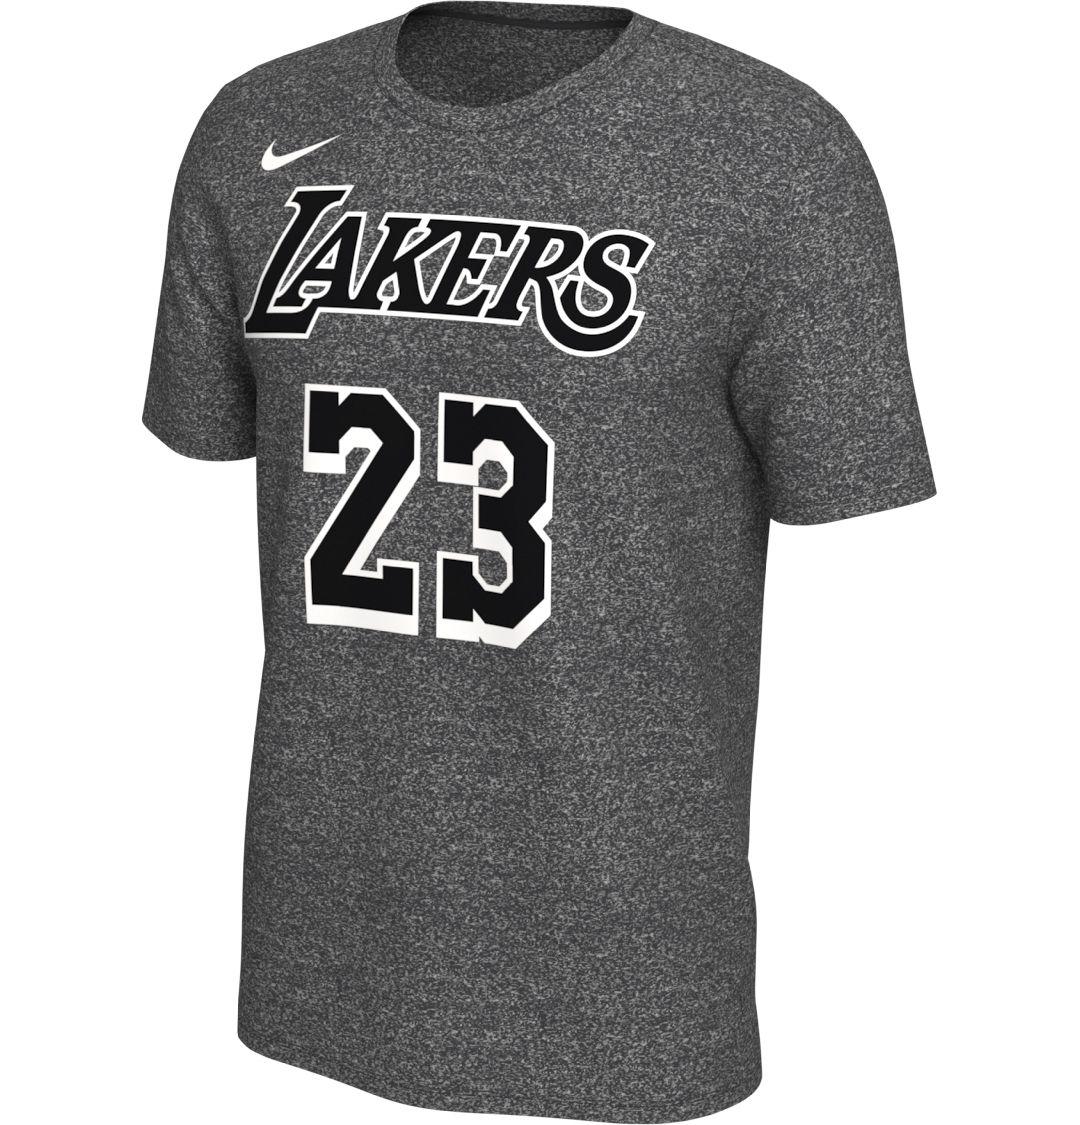 2b95467bc43a Nike Men's Los Angeles Lakers LeBron James #23 Dri-FIT Grey T-Shirt ...